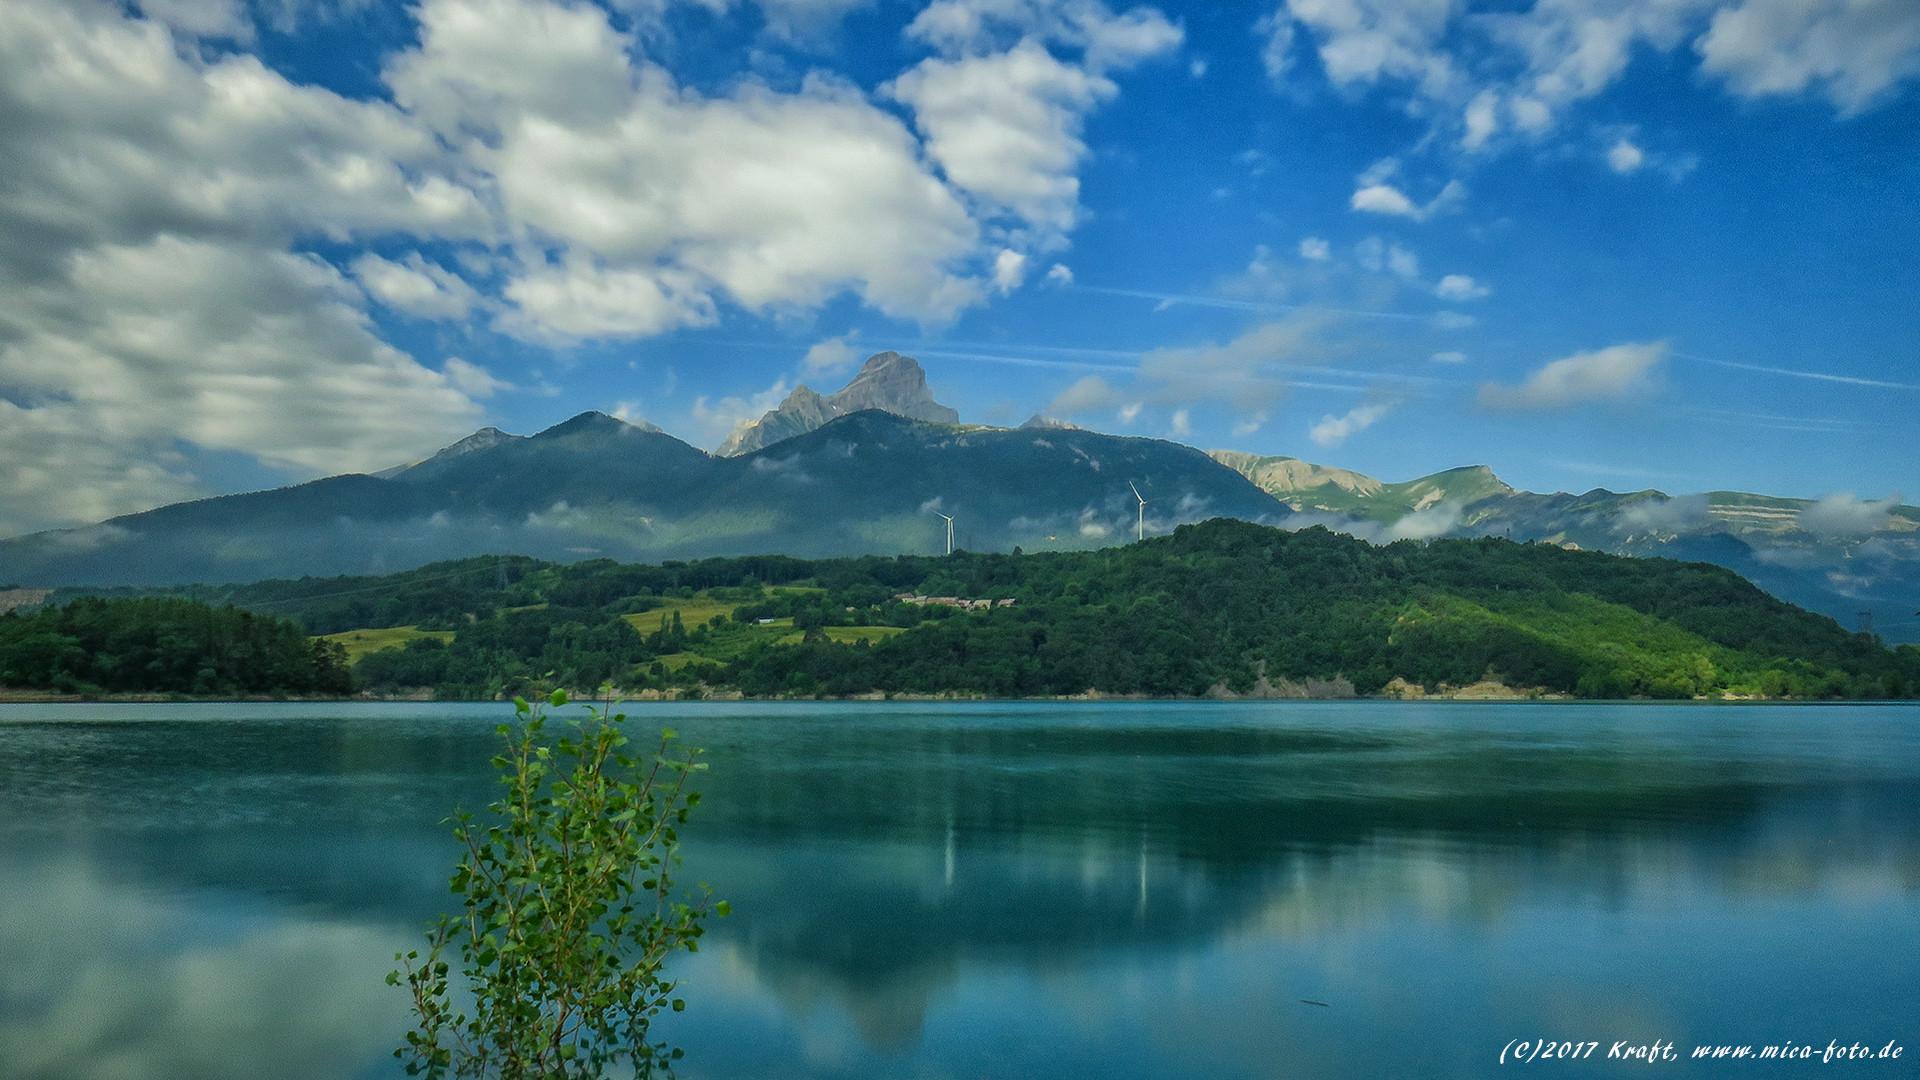 Res: 1920x1080, Wallpaper HD 16:9 Lac du Sautet am Morgen